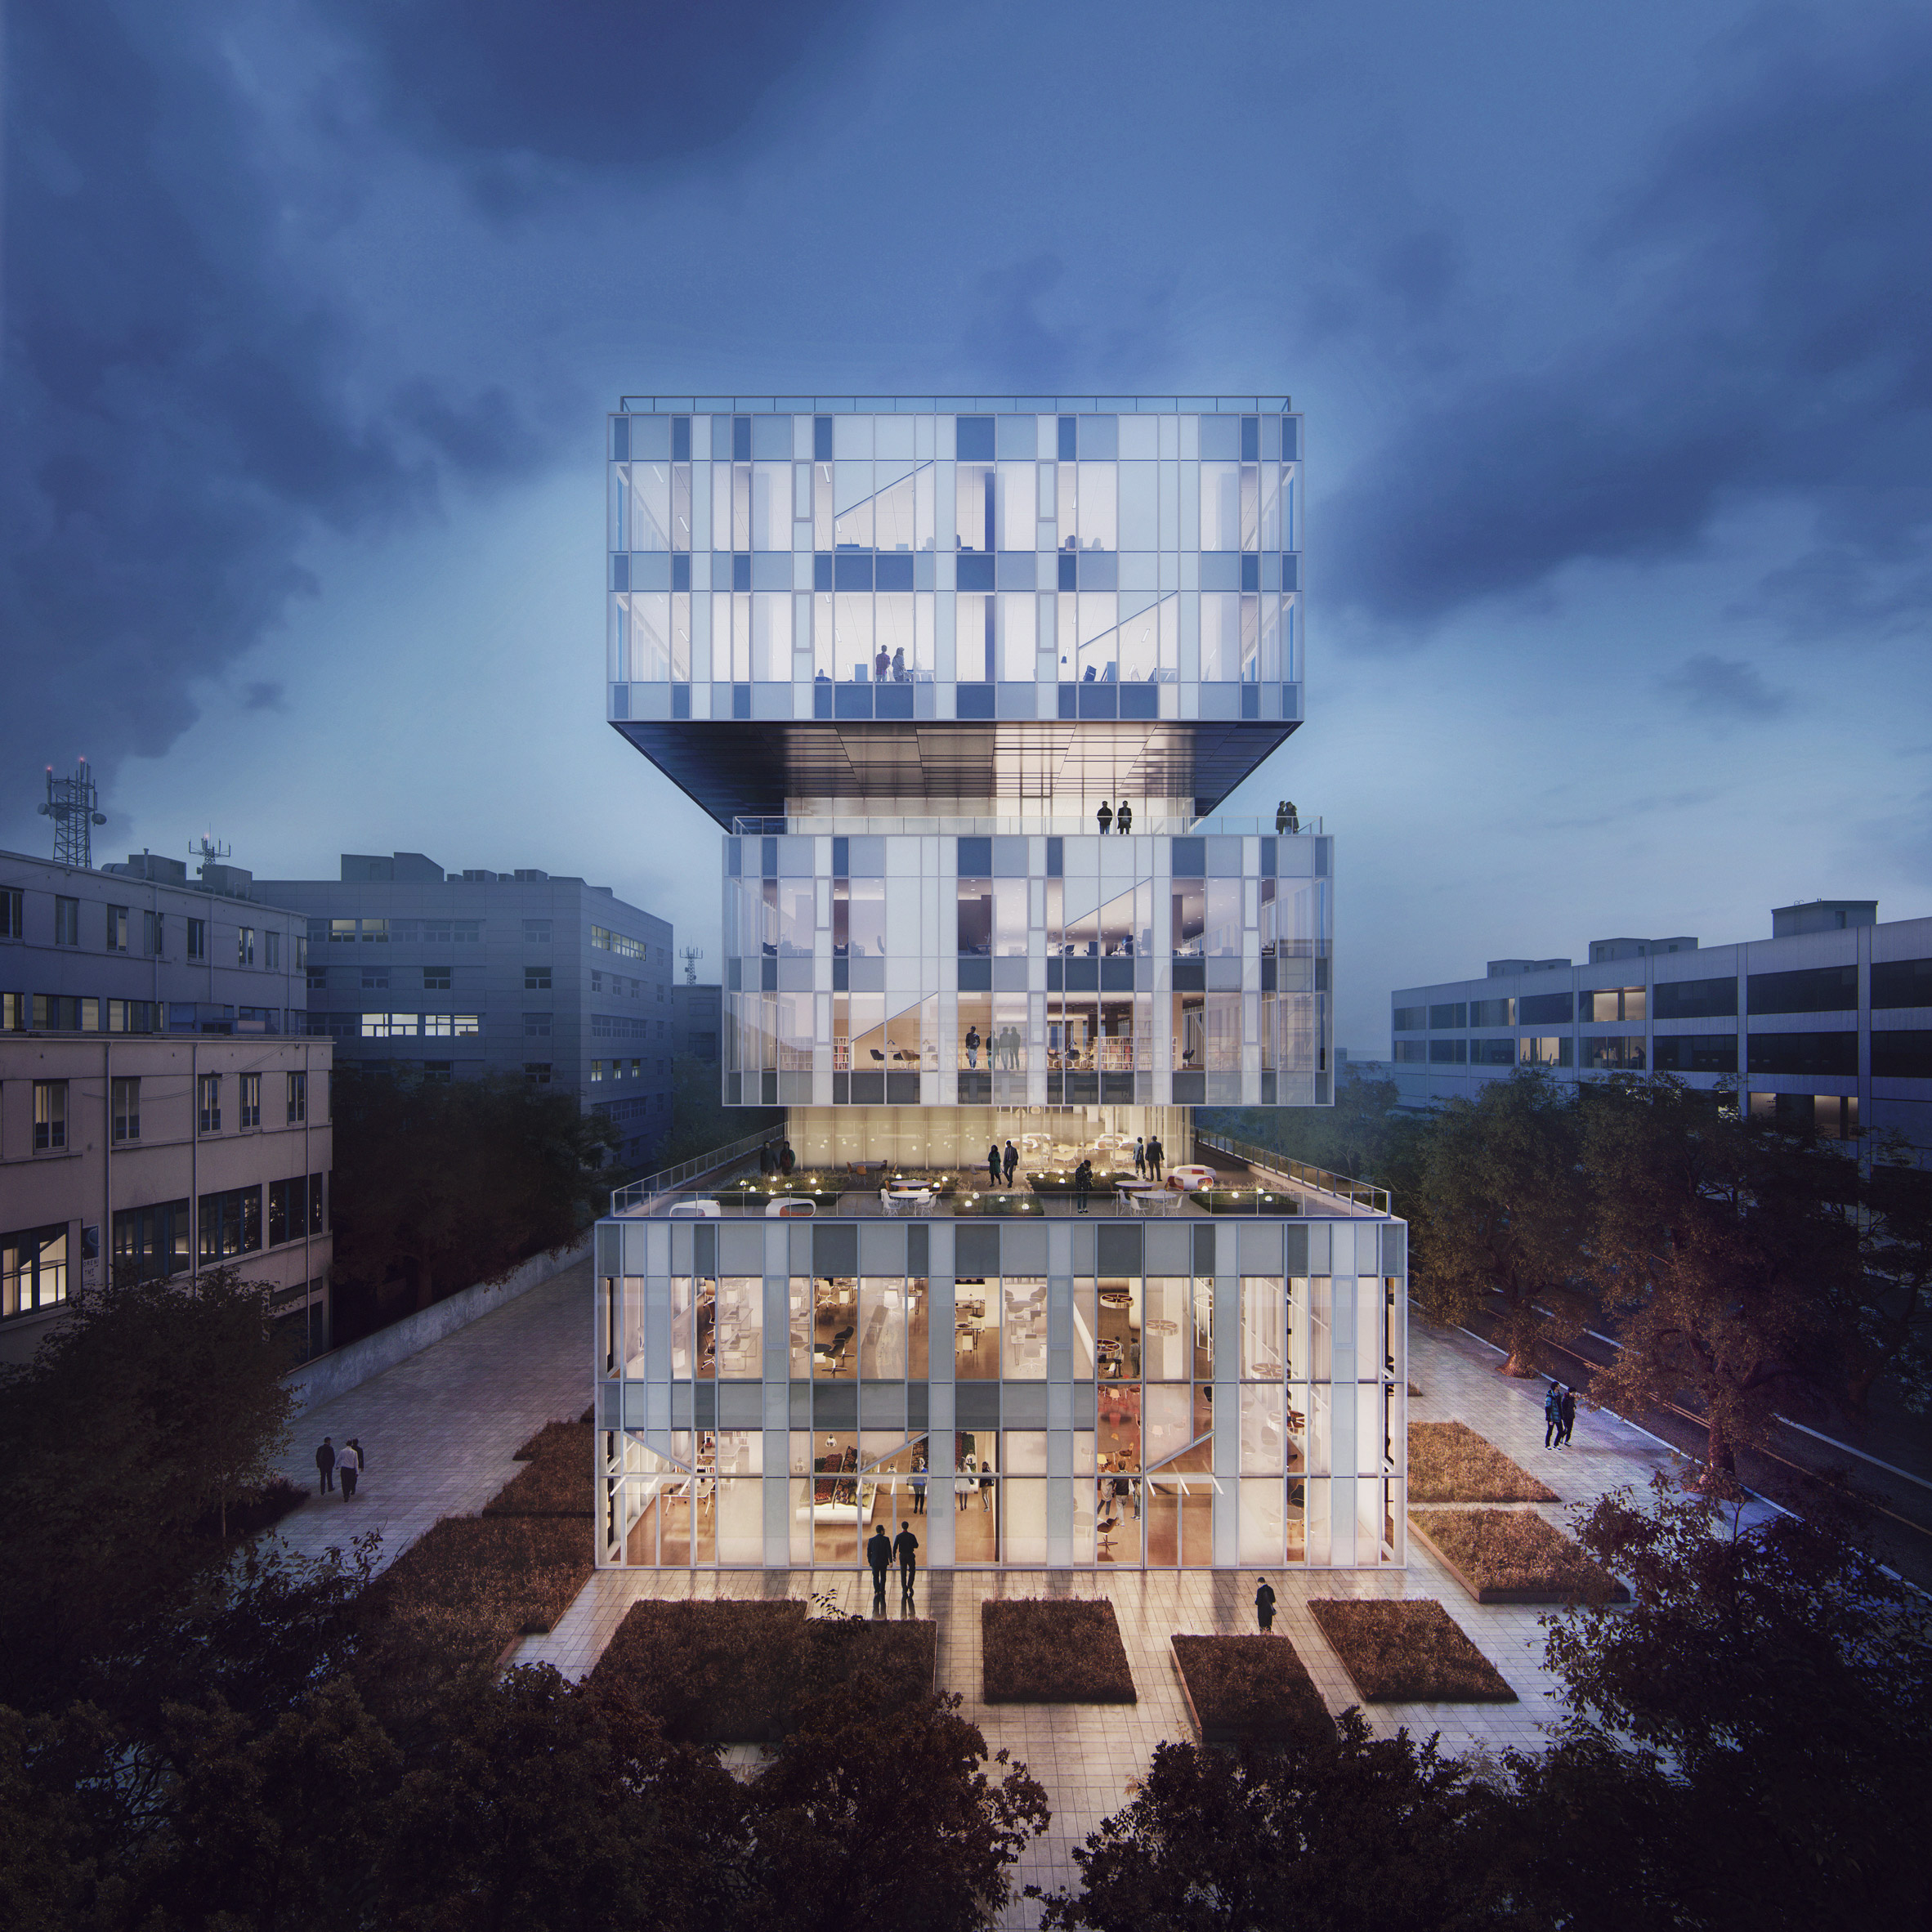 Work starts on Schmidt Hammer Lassen-designed innovation centre adapted to Shanghai's extreme weather